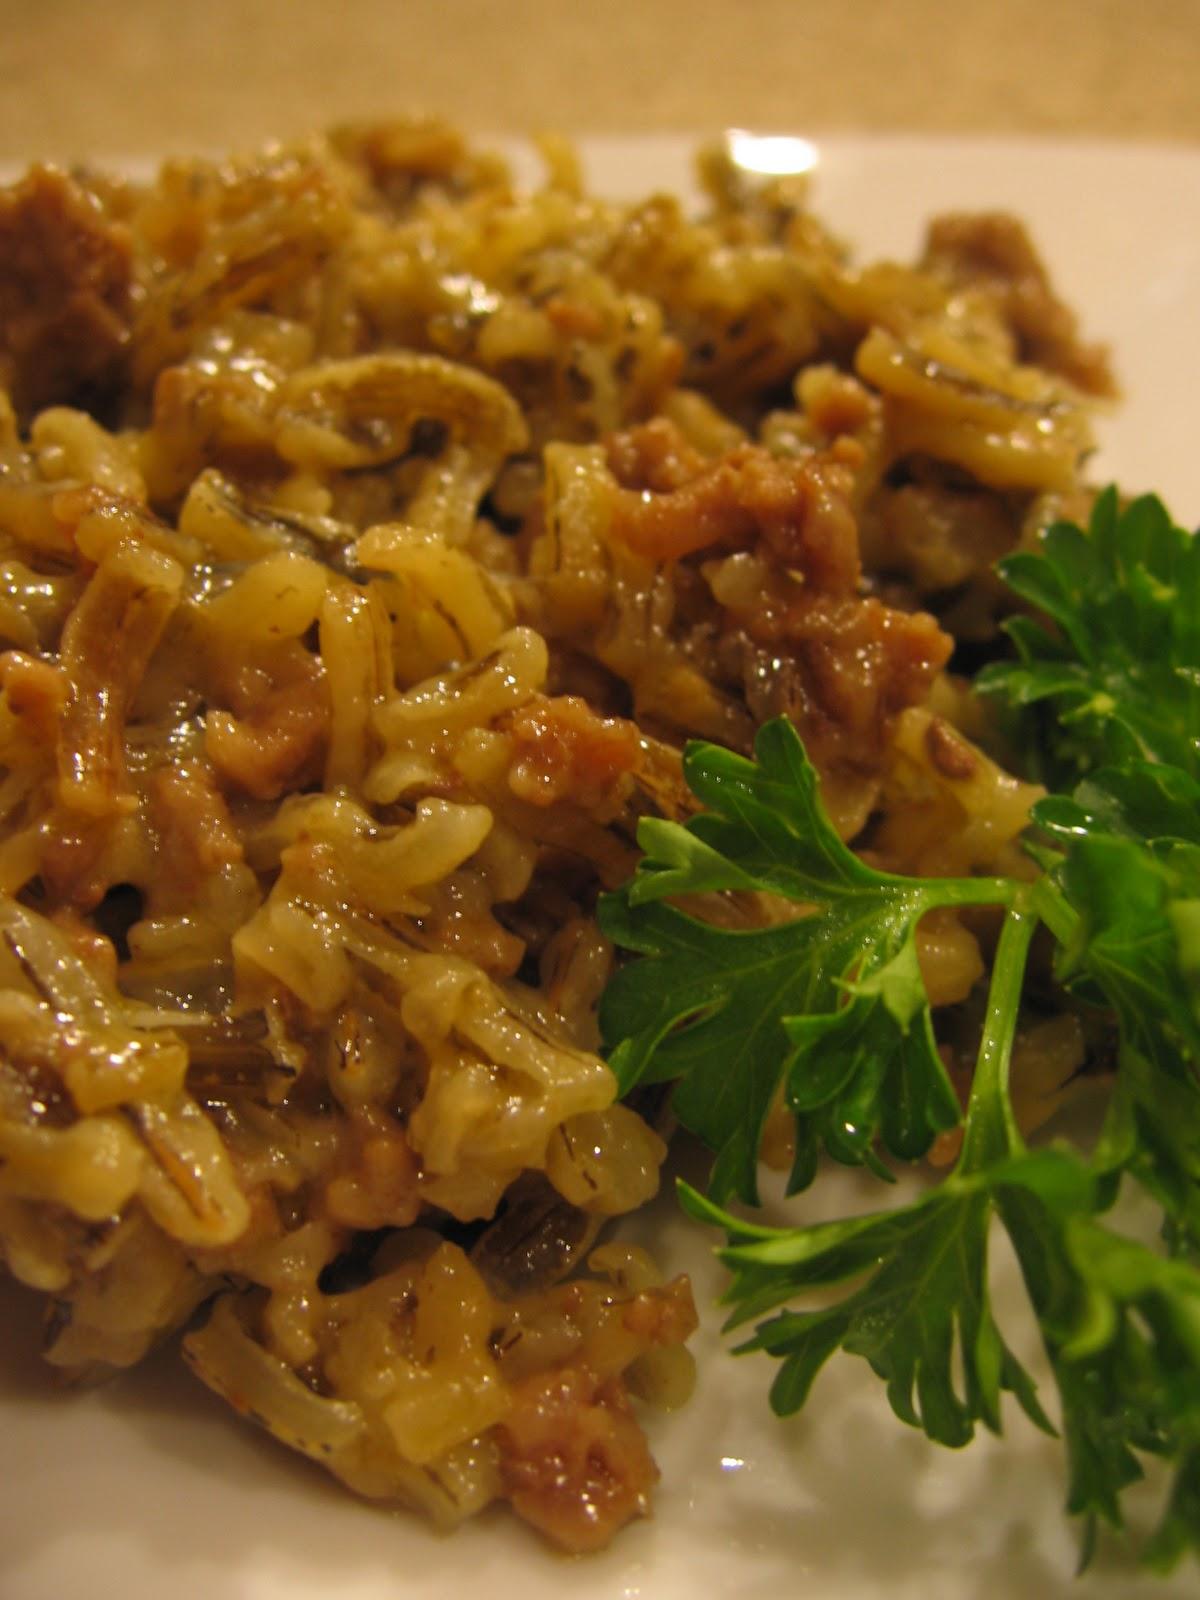 cookin' up north: Minnesota Wild Rice Hot dish